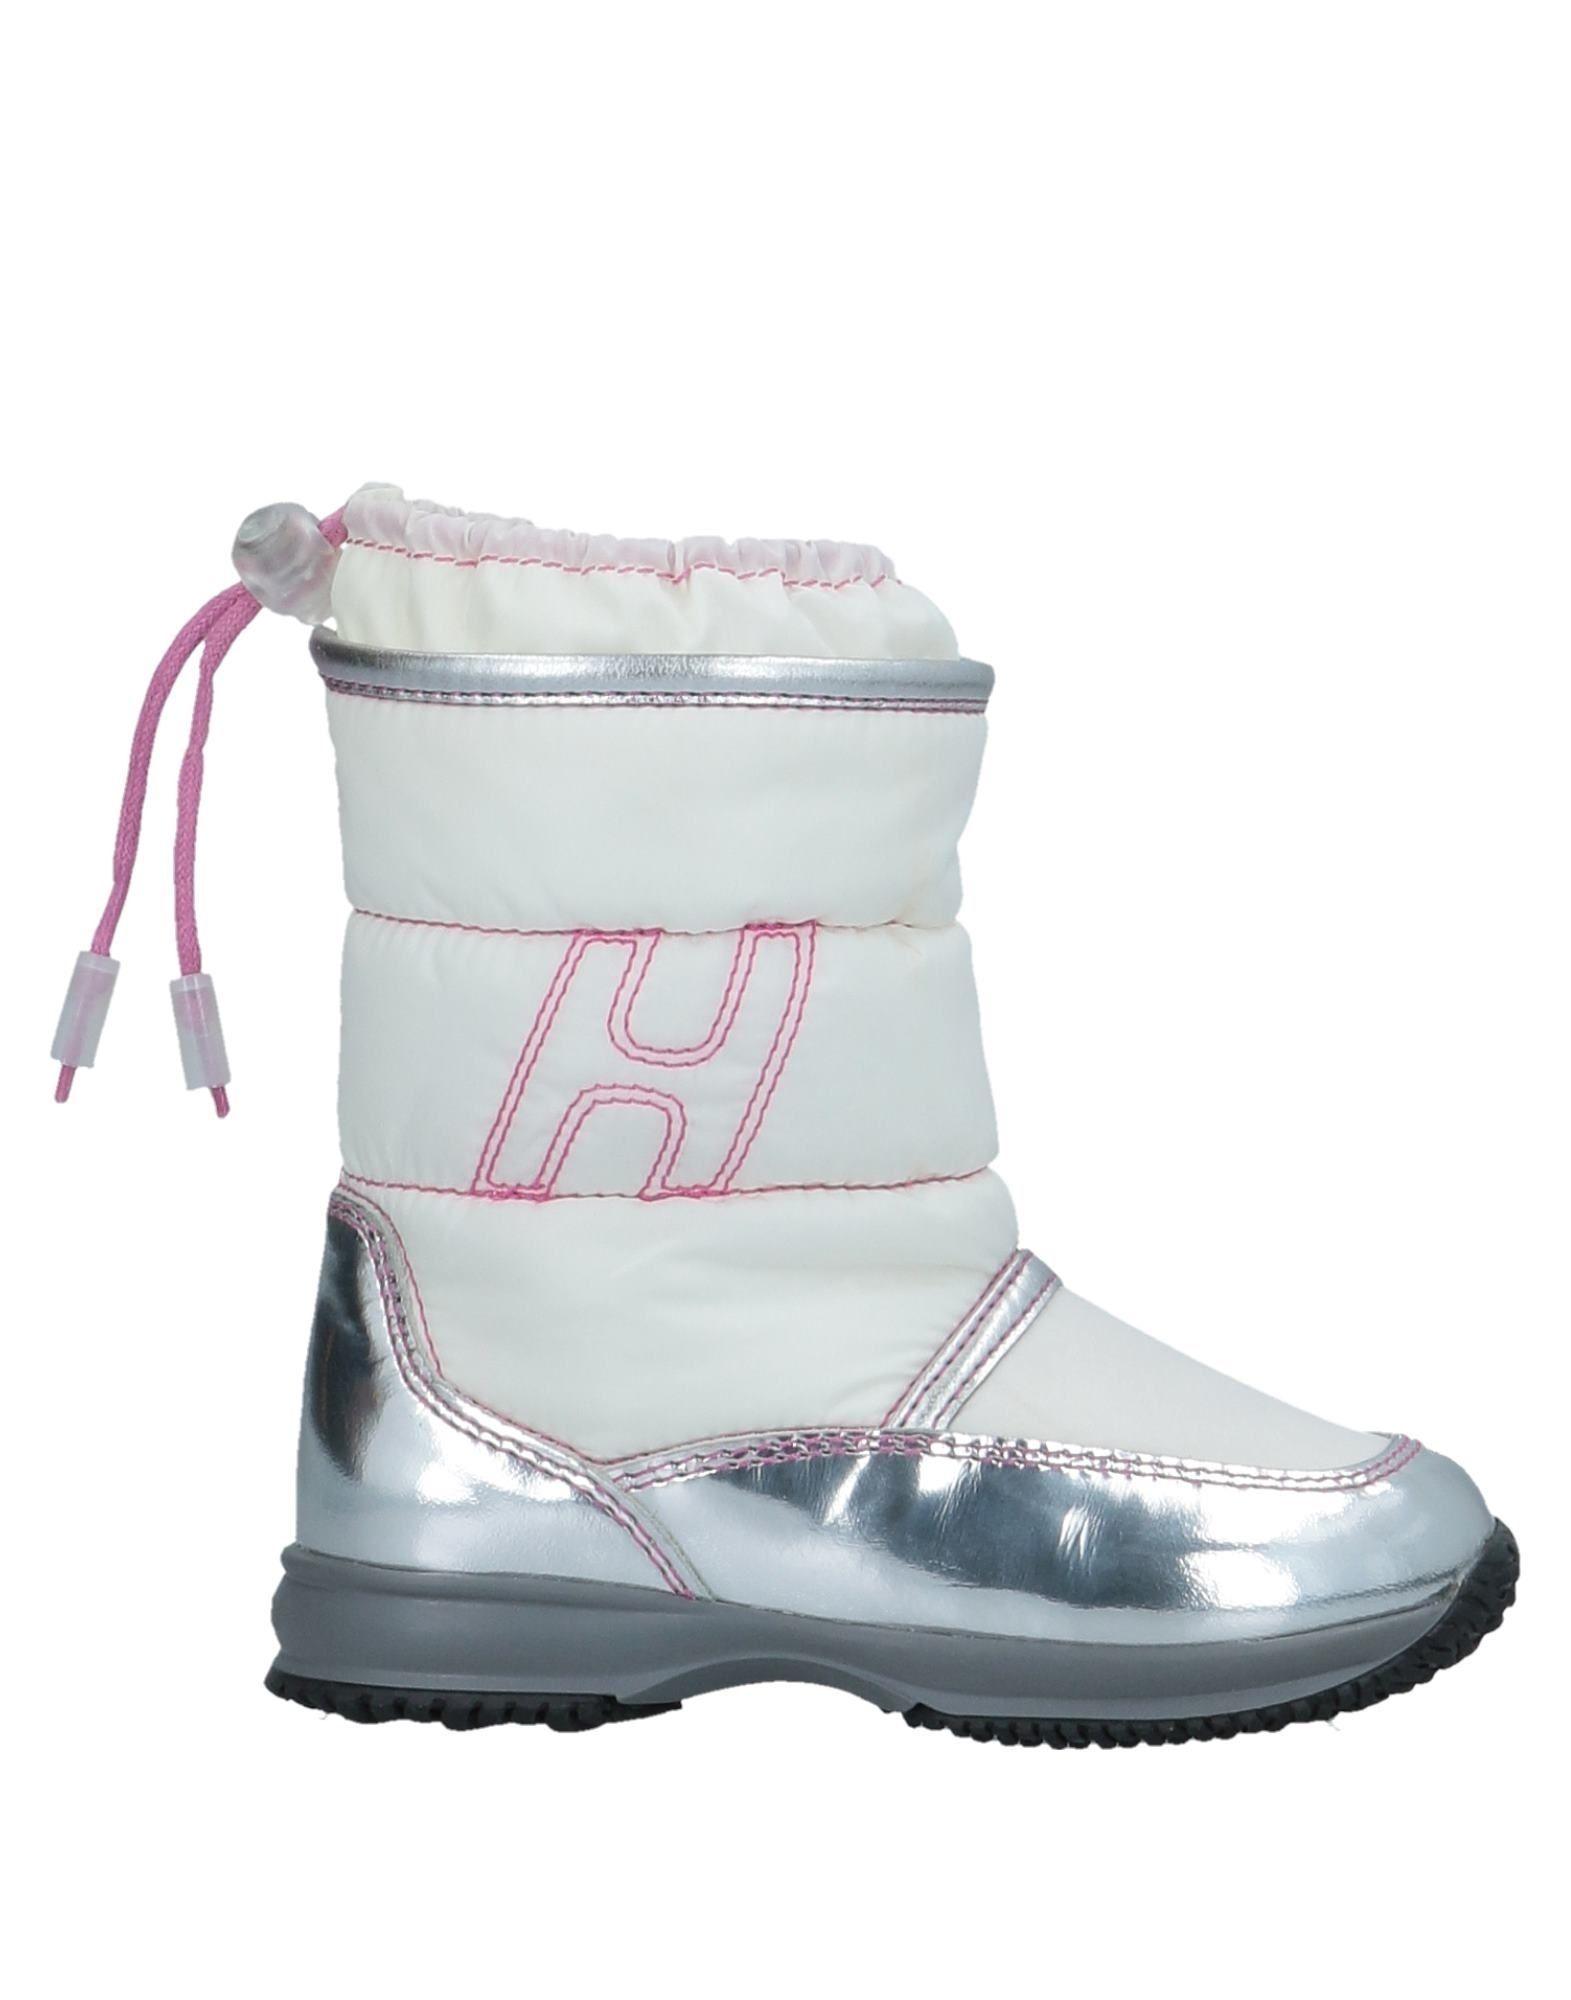 Hogan White Girls Leather Shoes